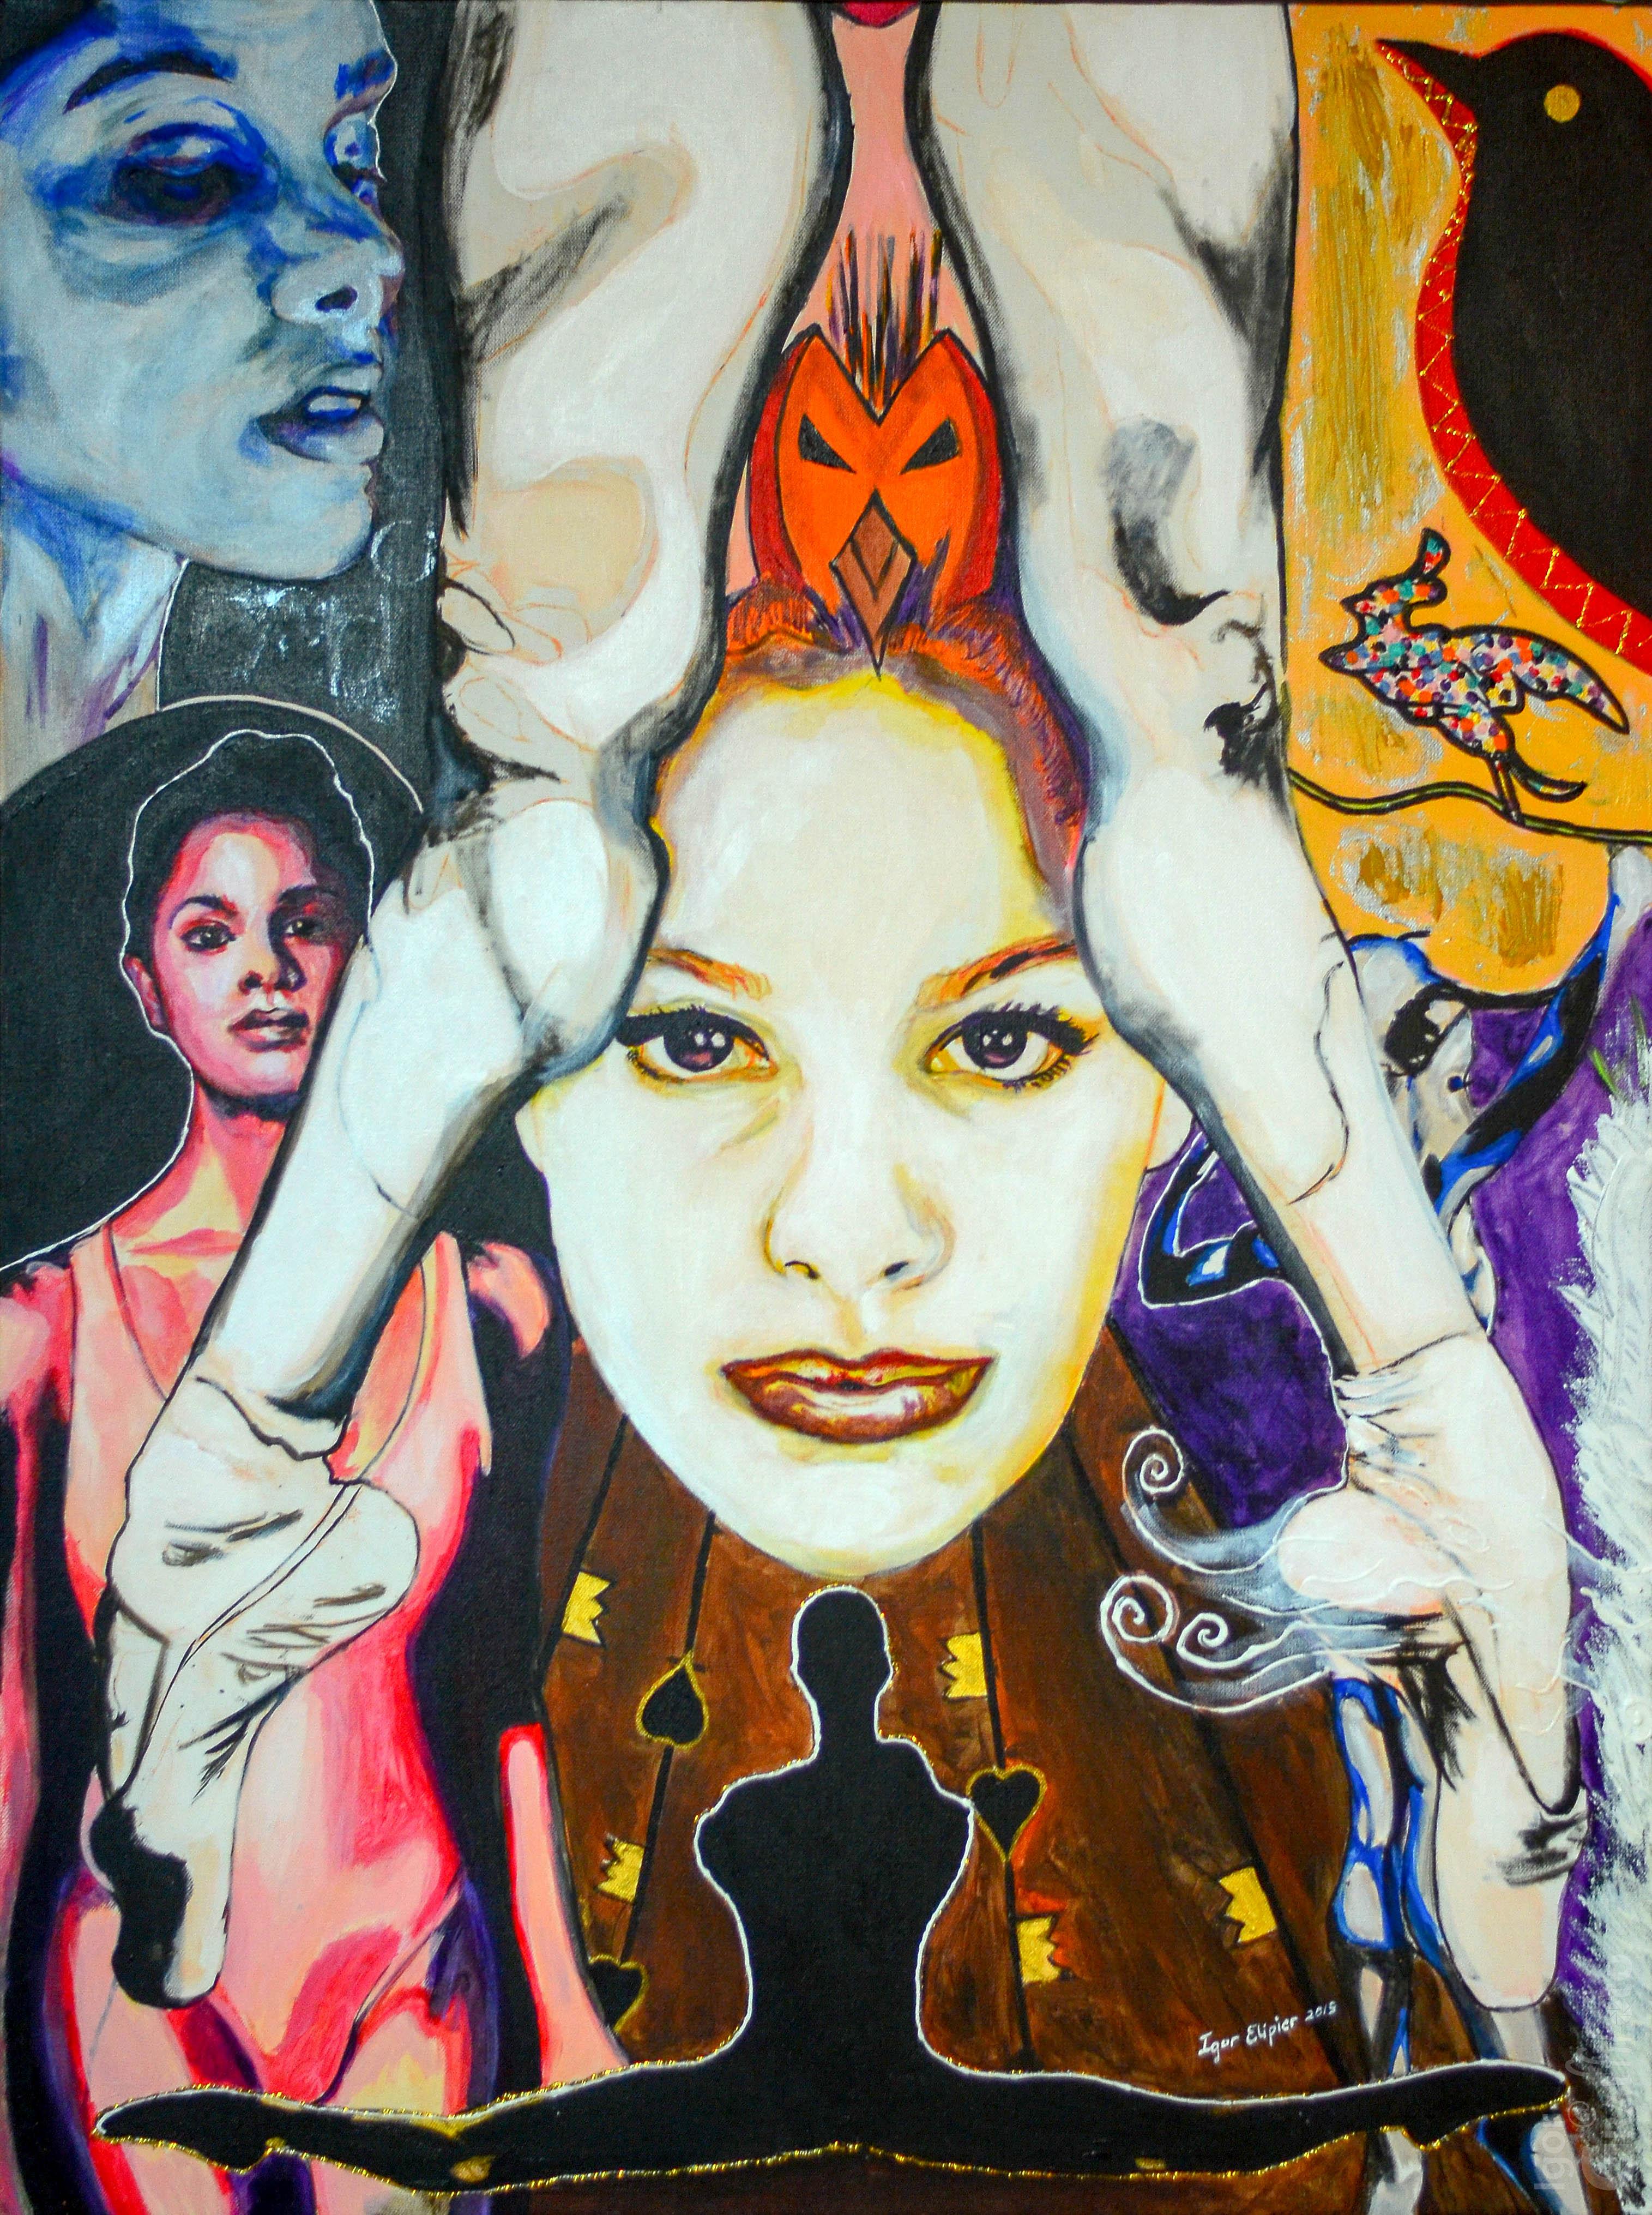 Acrylic Painting by Igor Elie-Pierre